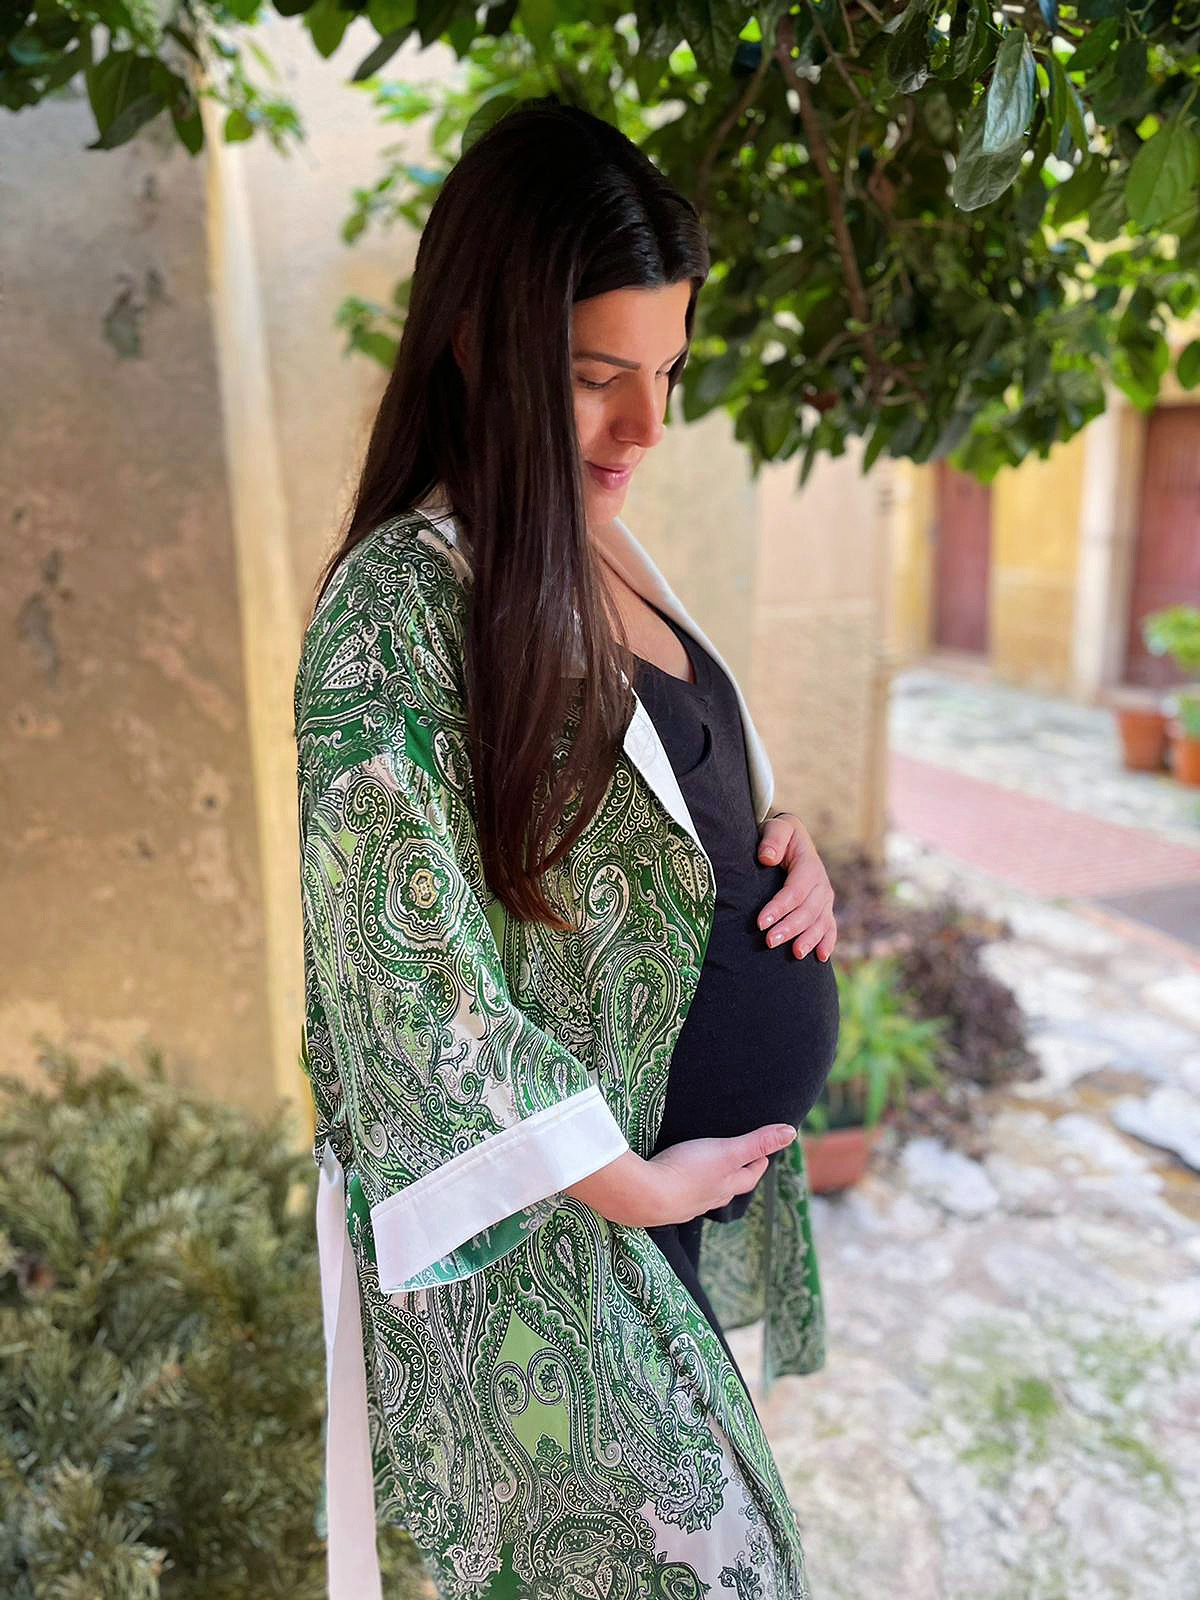 Mummy-to-be Eleanor in our 'Maya' kimono